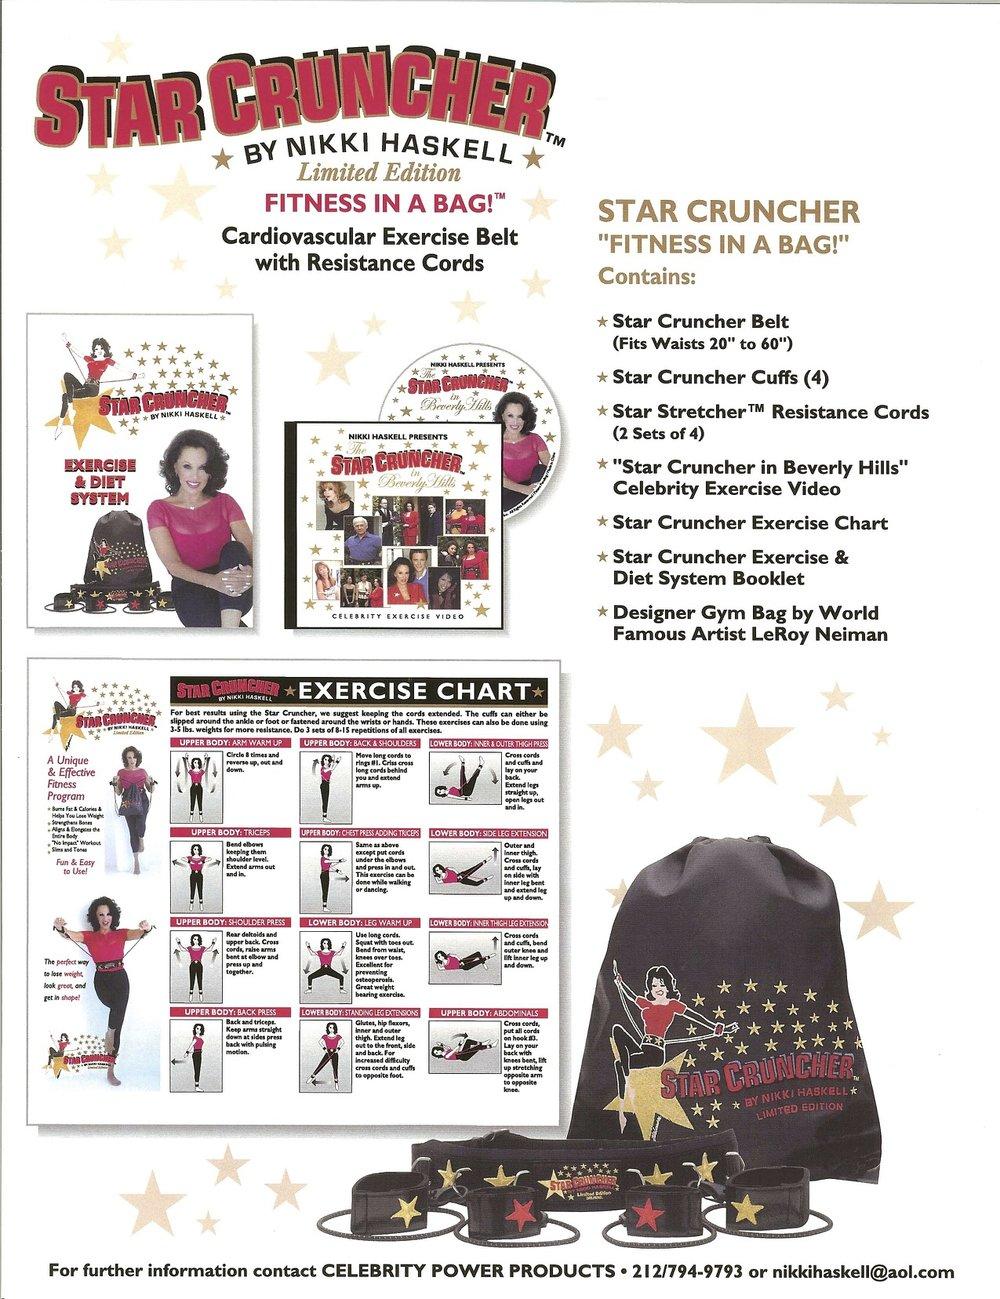 Star Cruncher 2